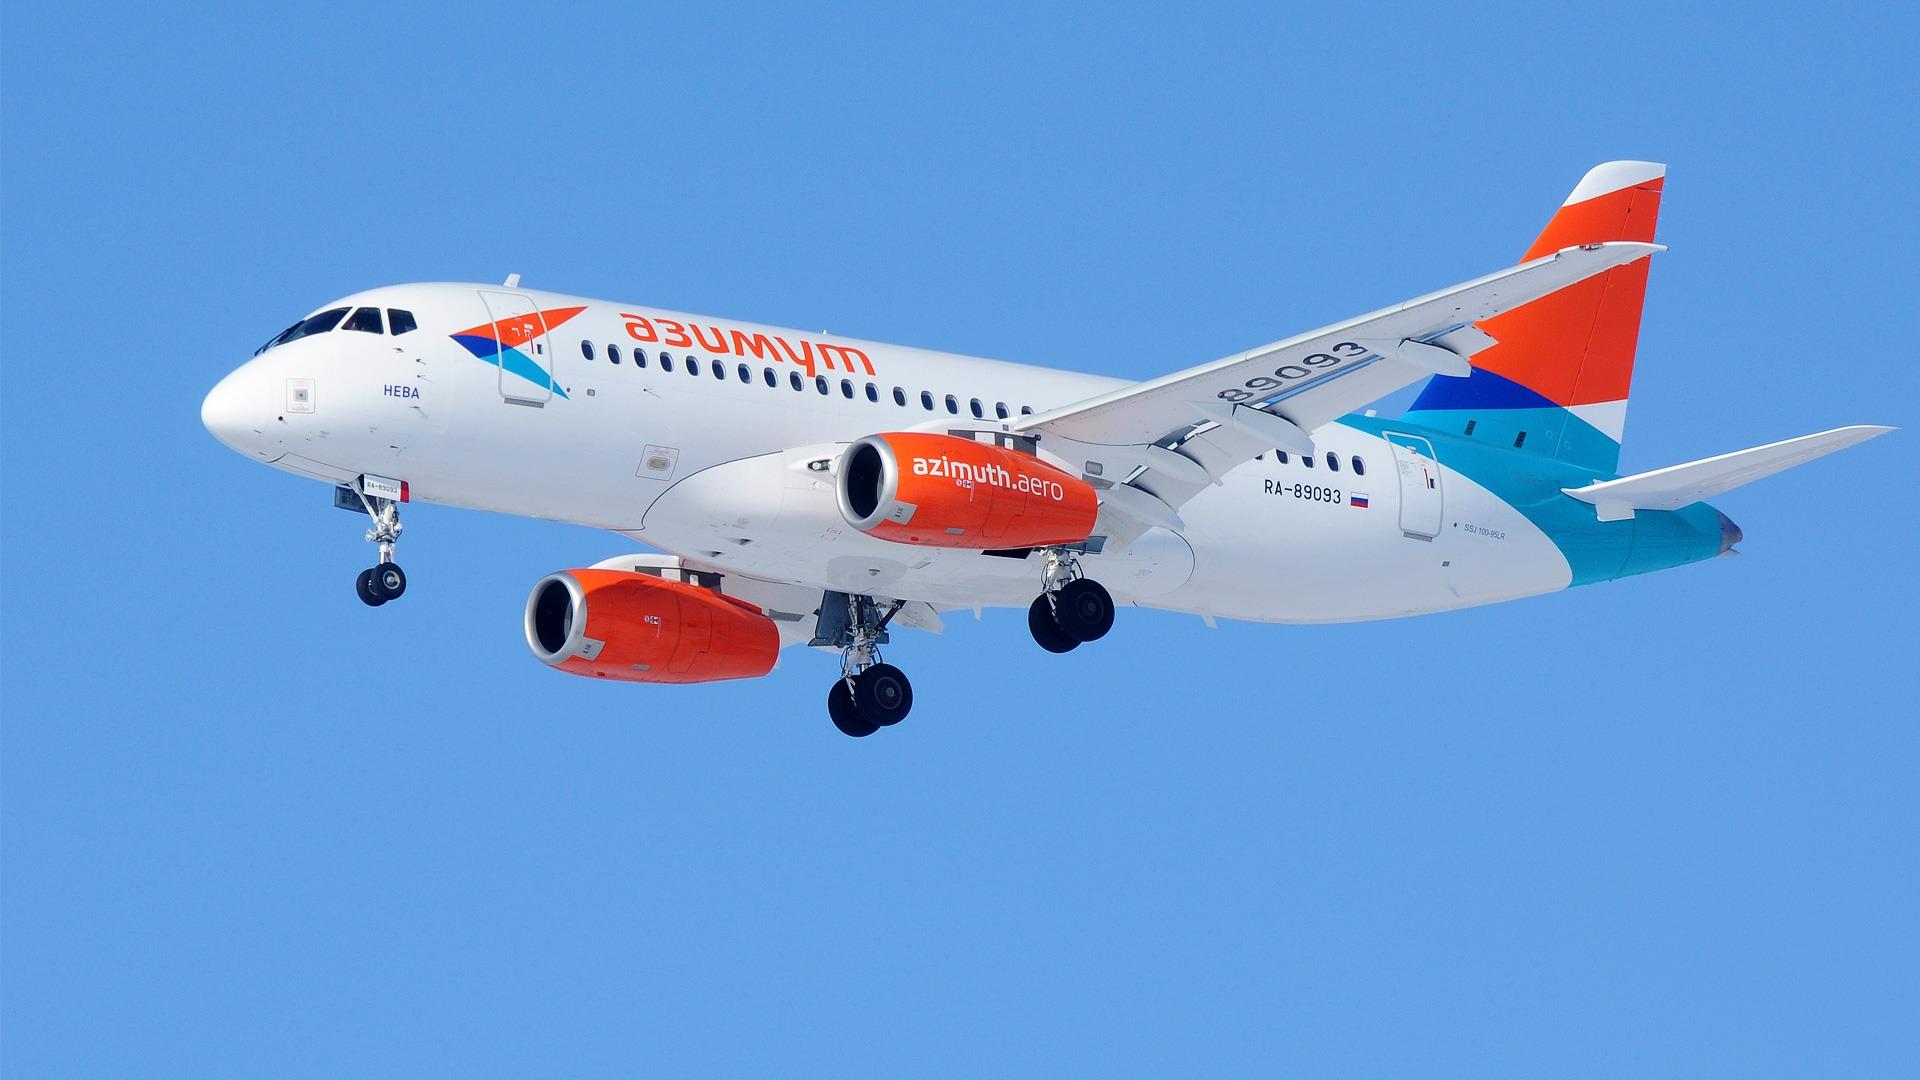 Авиакомпания, Азимут, azimuth, airlines, airplane, livery, branding, aicraft, ssj100, sukhoi, sukhoisuperjet, superjet100, SSJ-100, Сухой суперджет, брендинг авиакомпании